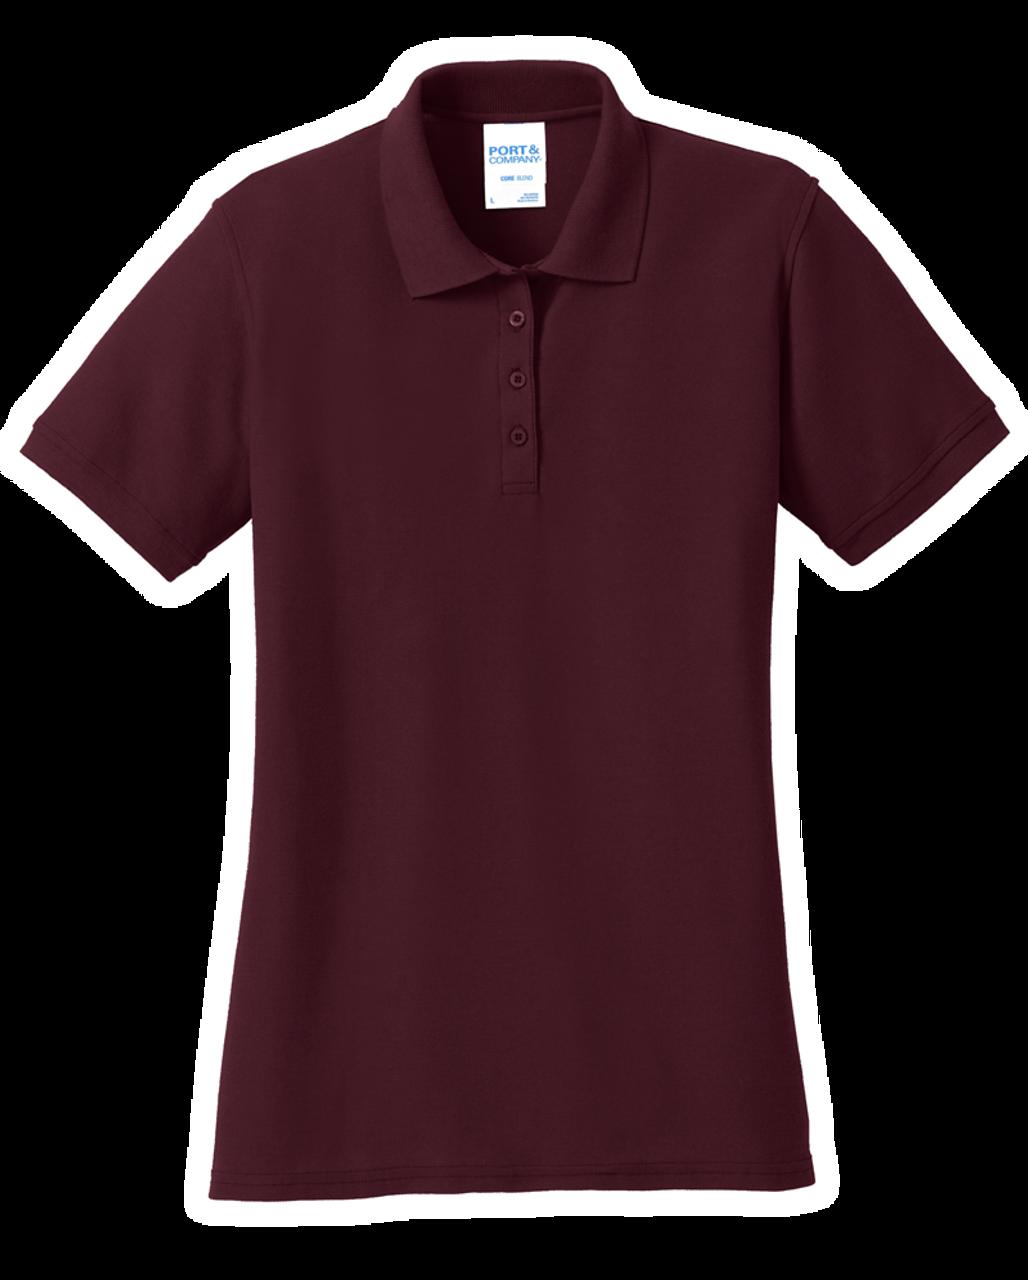 LKP155: Ladies Core Blend Pique Polo by Port & Company